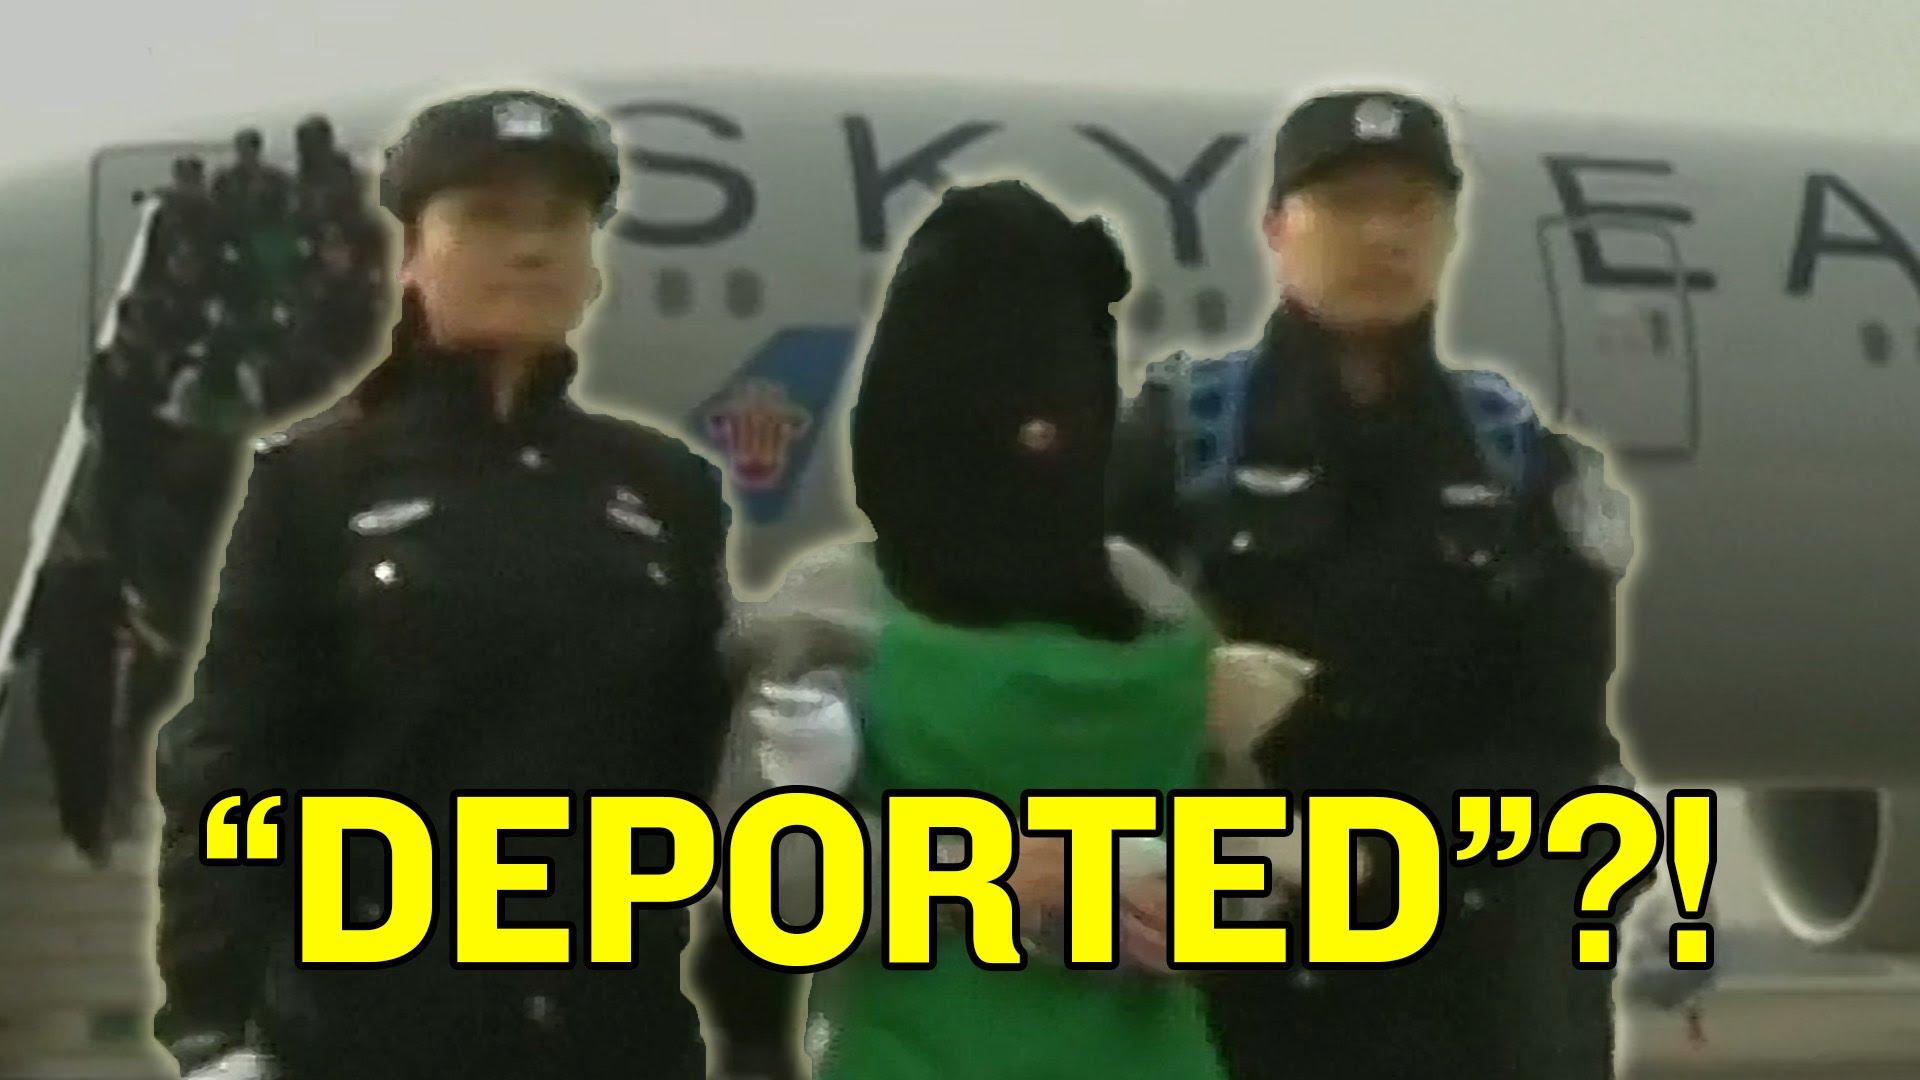 「台灣人犯罪大陸辦?老外看肯亞電信詐騙案」- Taiwanese Deported to China—What's the Problem?